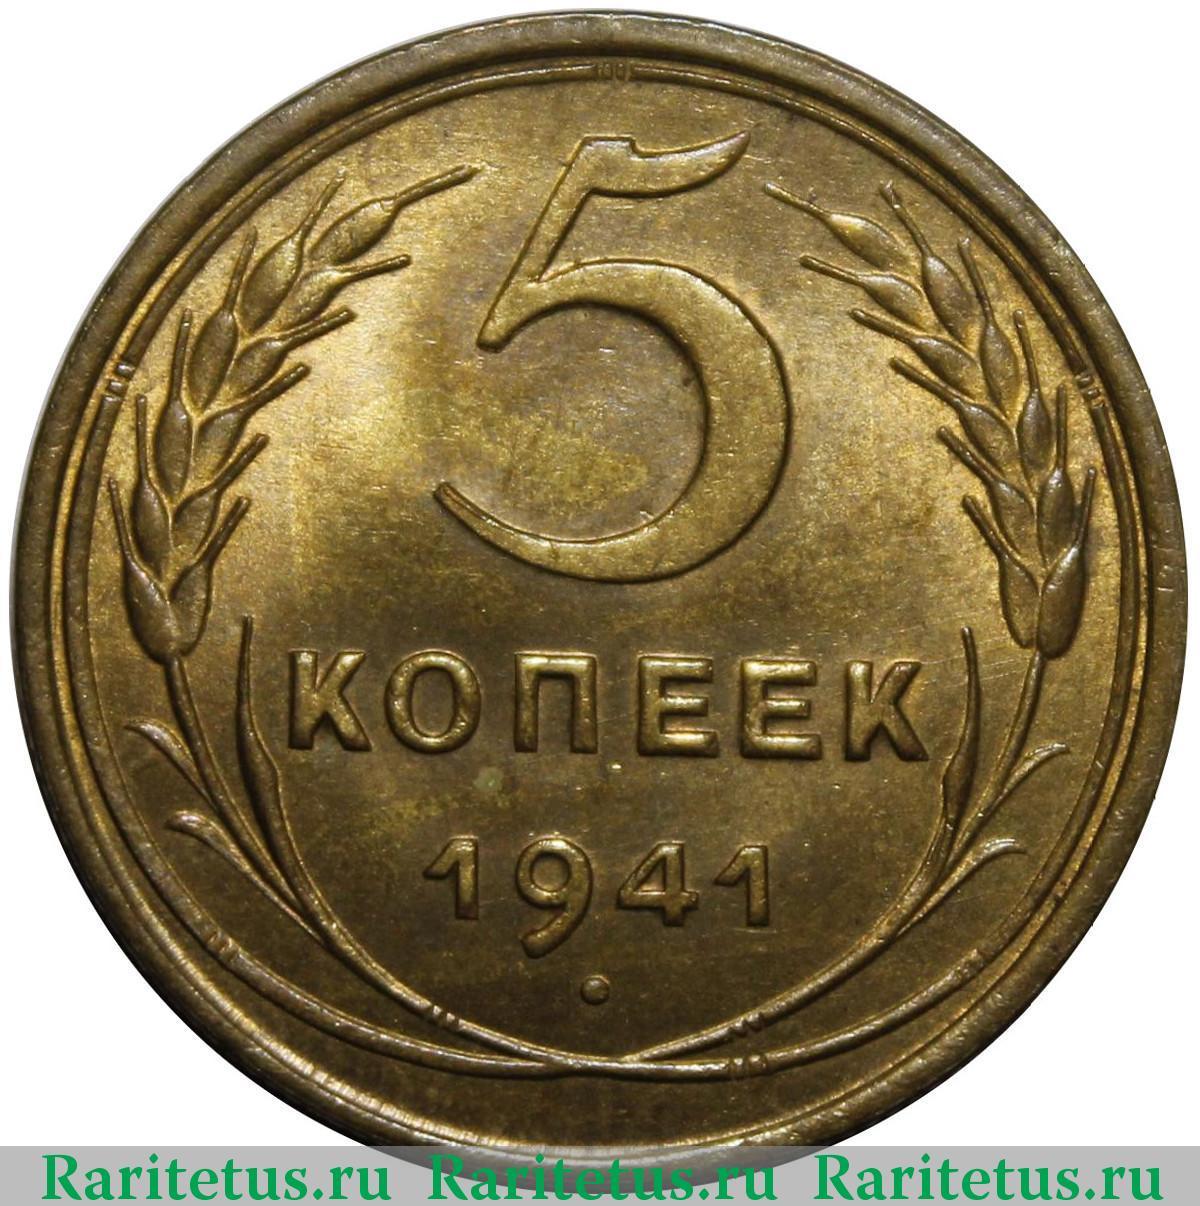 5 коп 1941 года цена разновидность монеты олимпиада в корее 2018